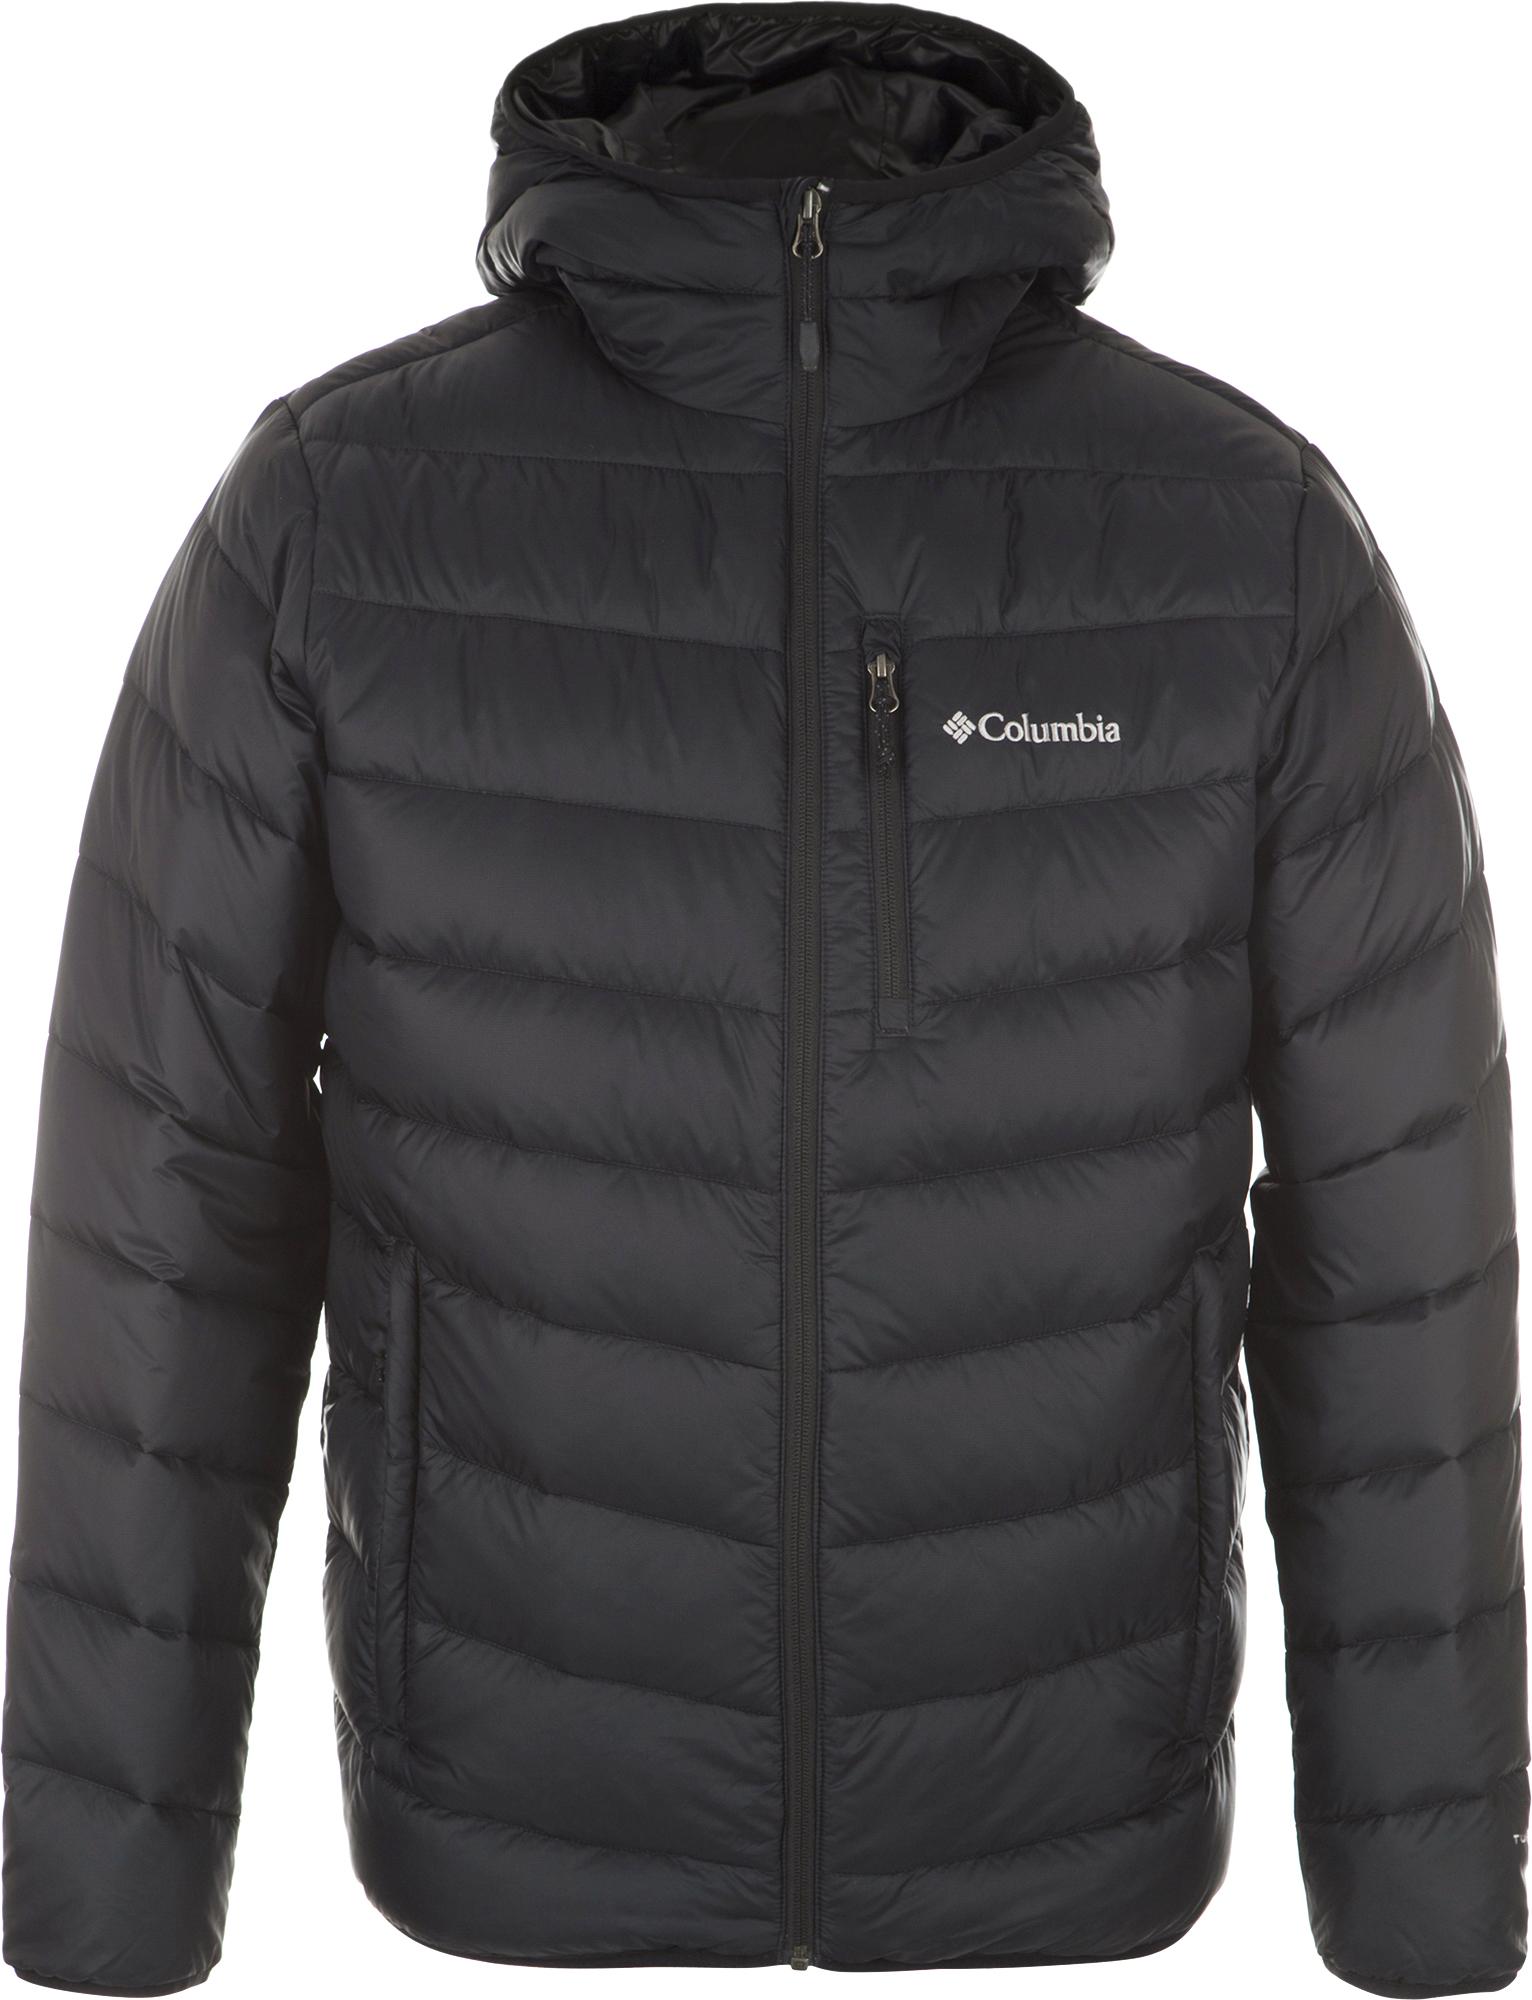 Columbia Куртка пуховая мужская Columbia Hellfire 650 TurboDown, размер 46-48 цена